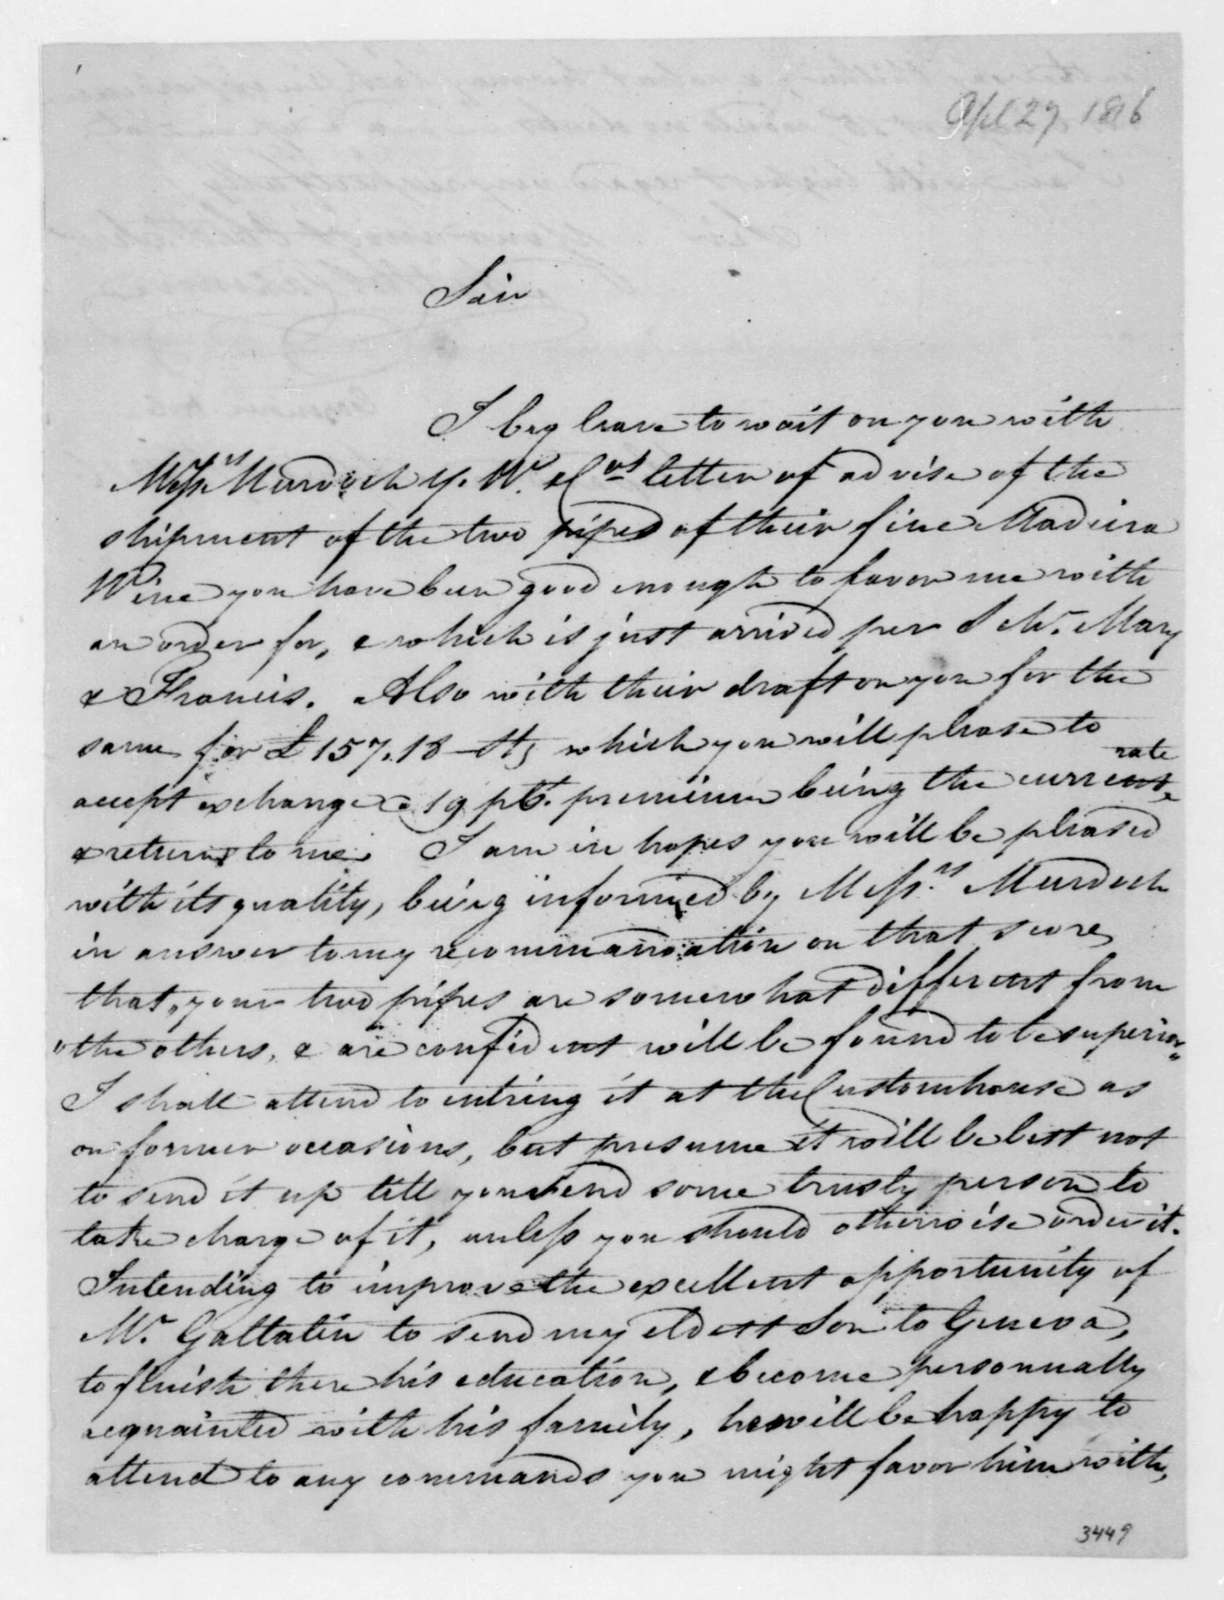 A. C. Cazenove to James Madison, April 27, 1816.